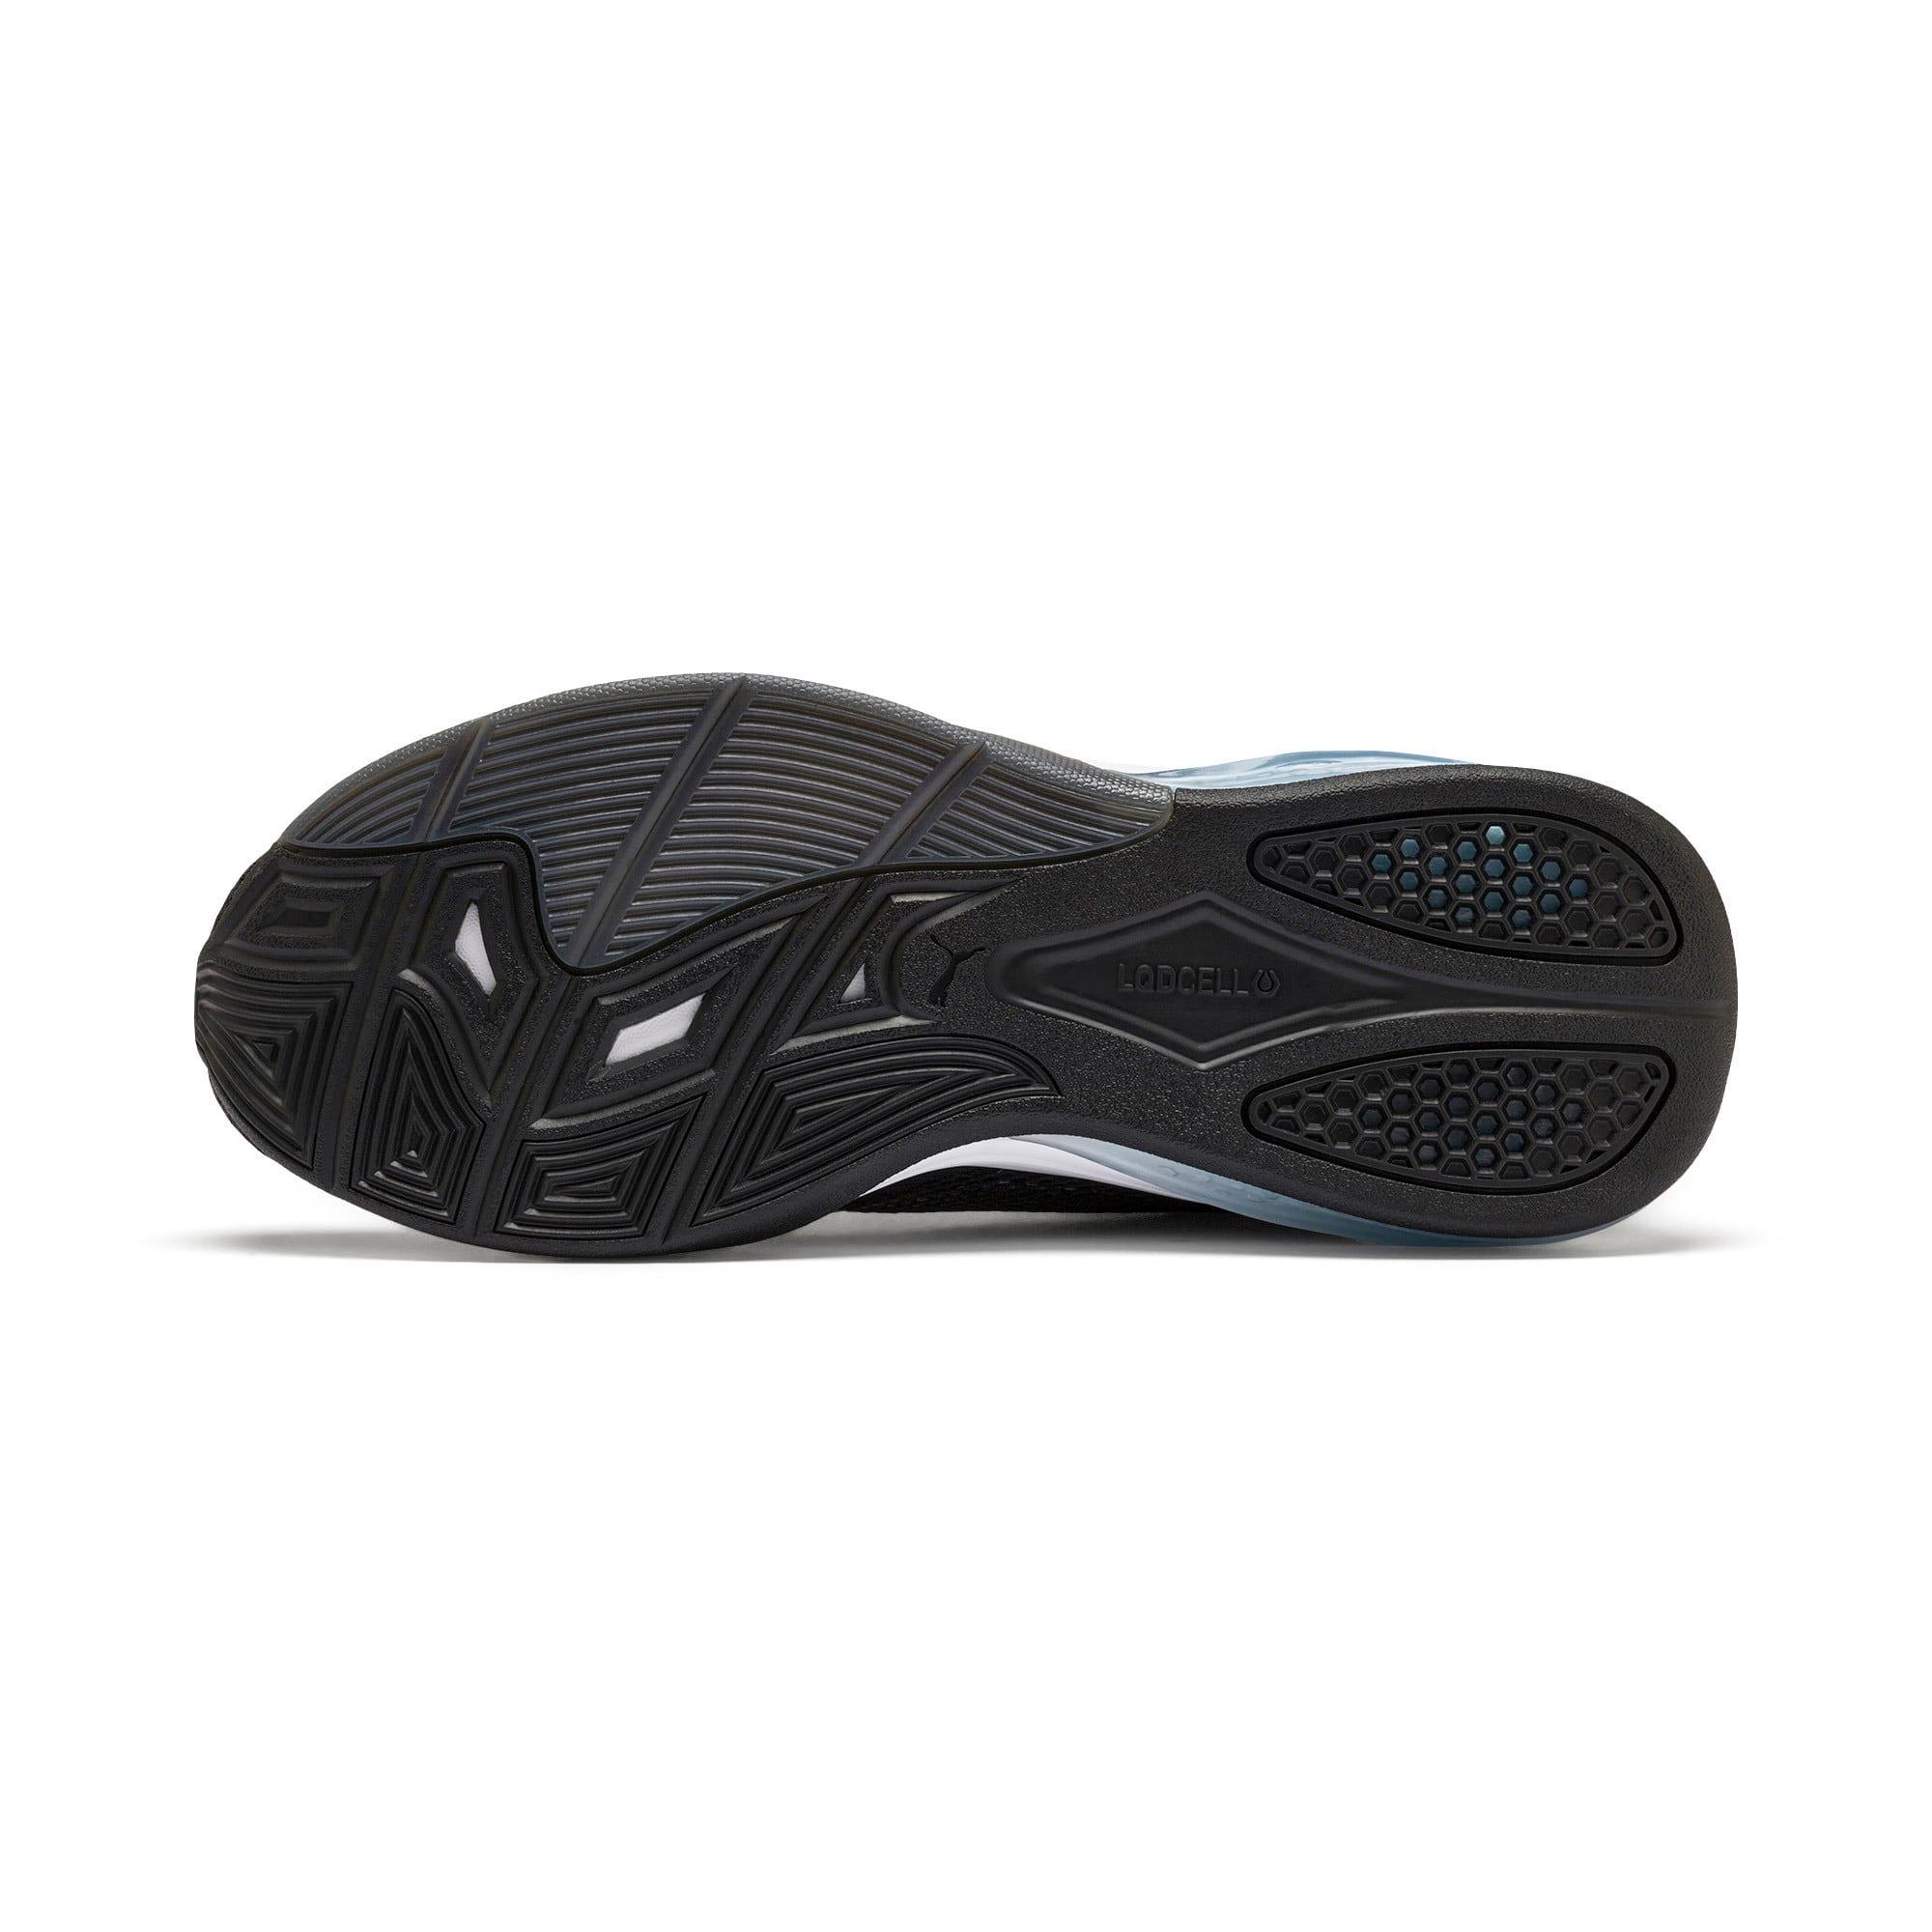 Thumbnail 7 of LQDCELL Tension Men's Training Shoes, Puma Black-Puma White, medium-IND